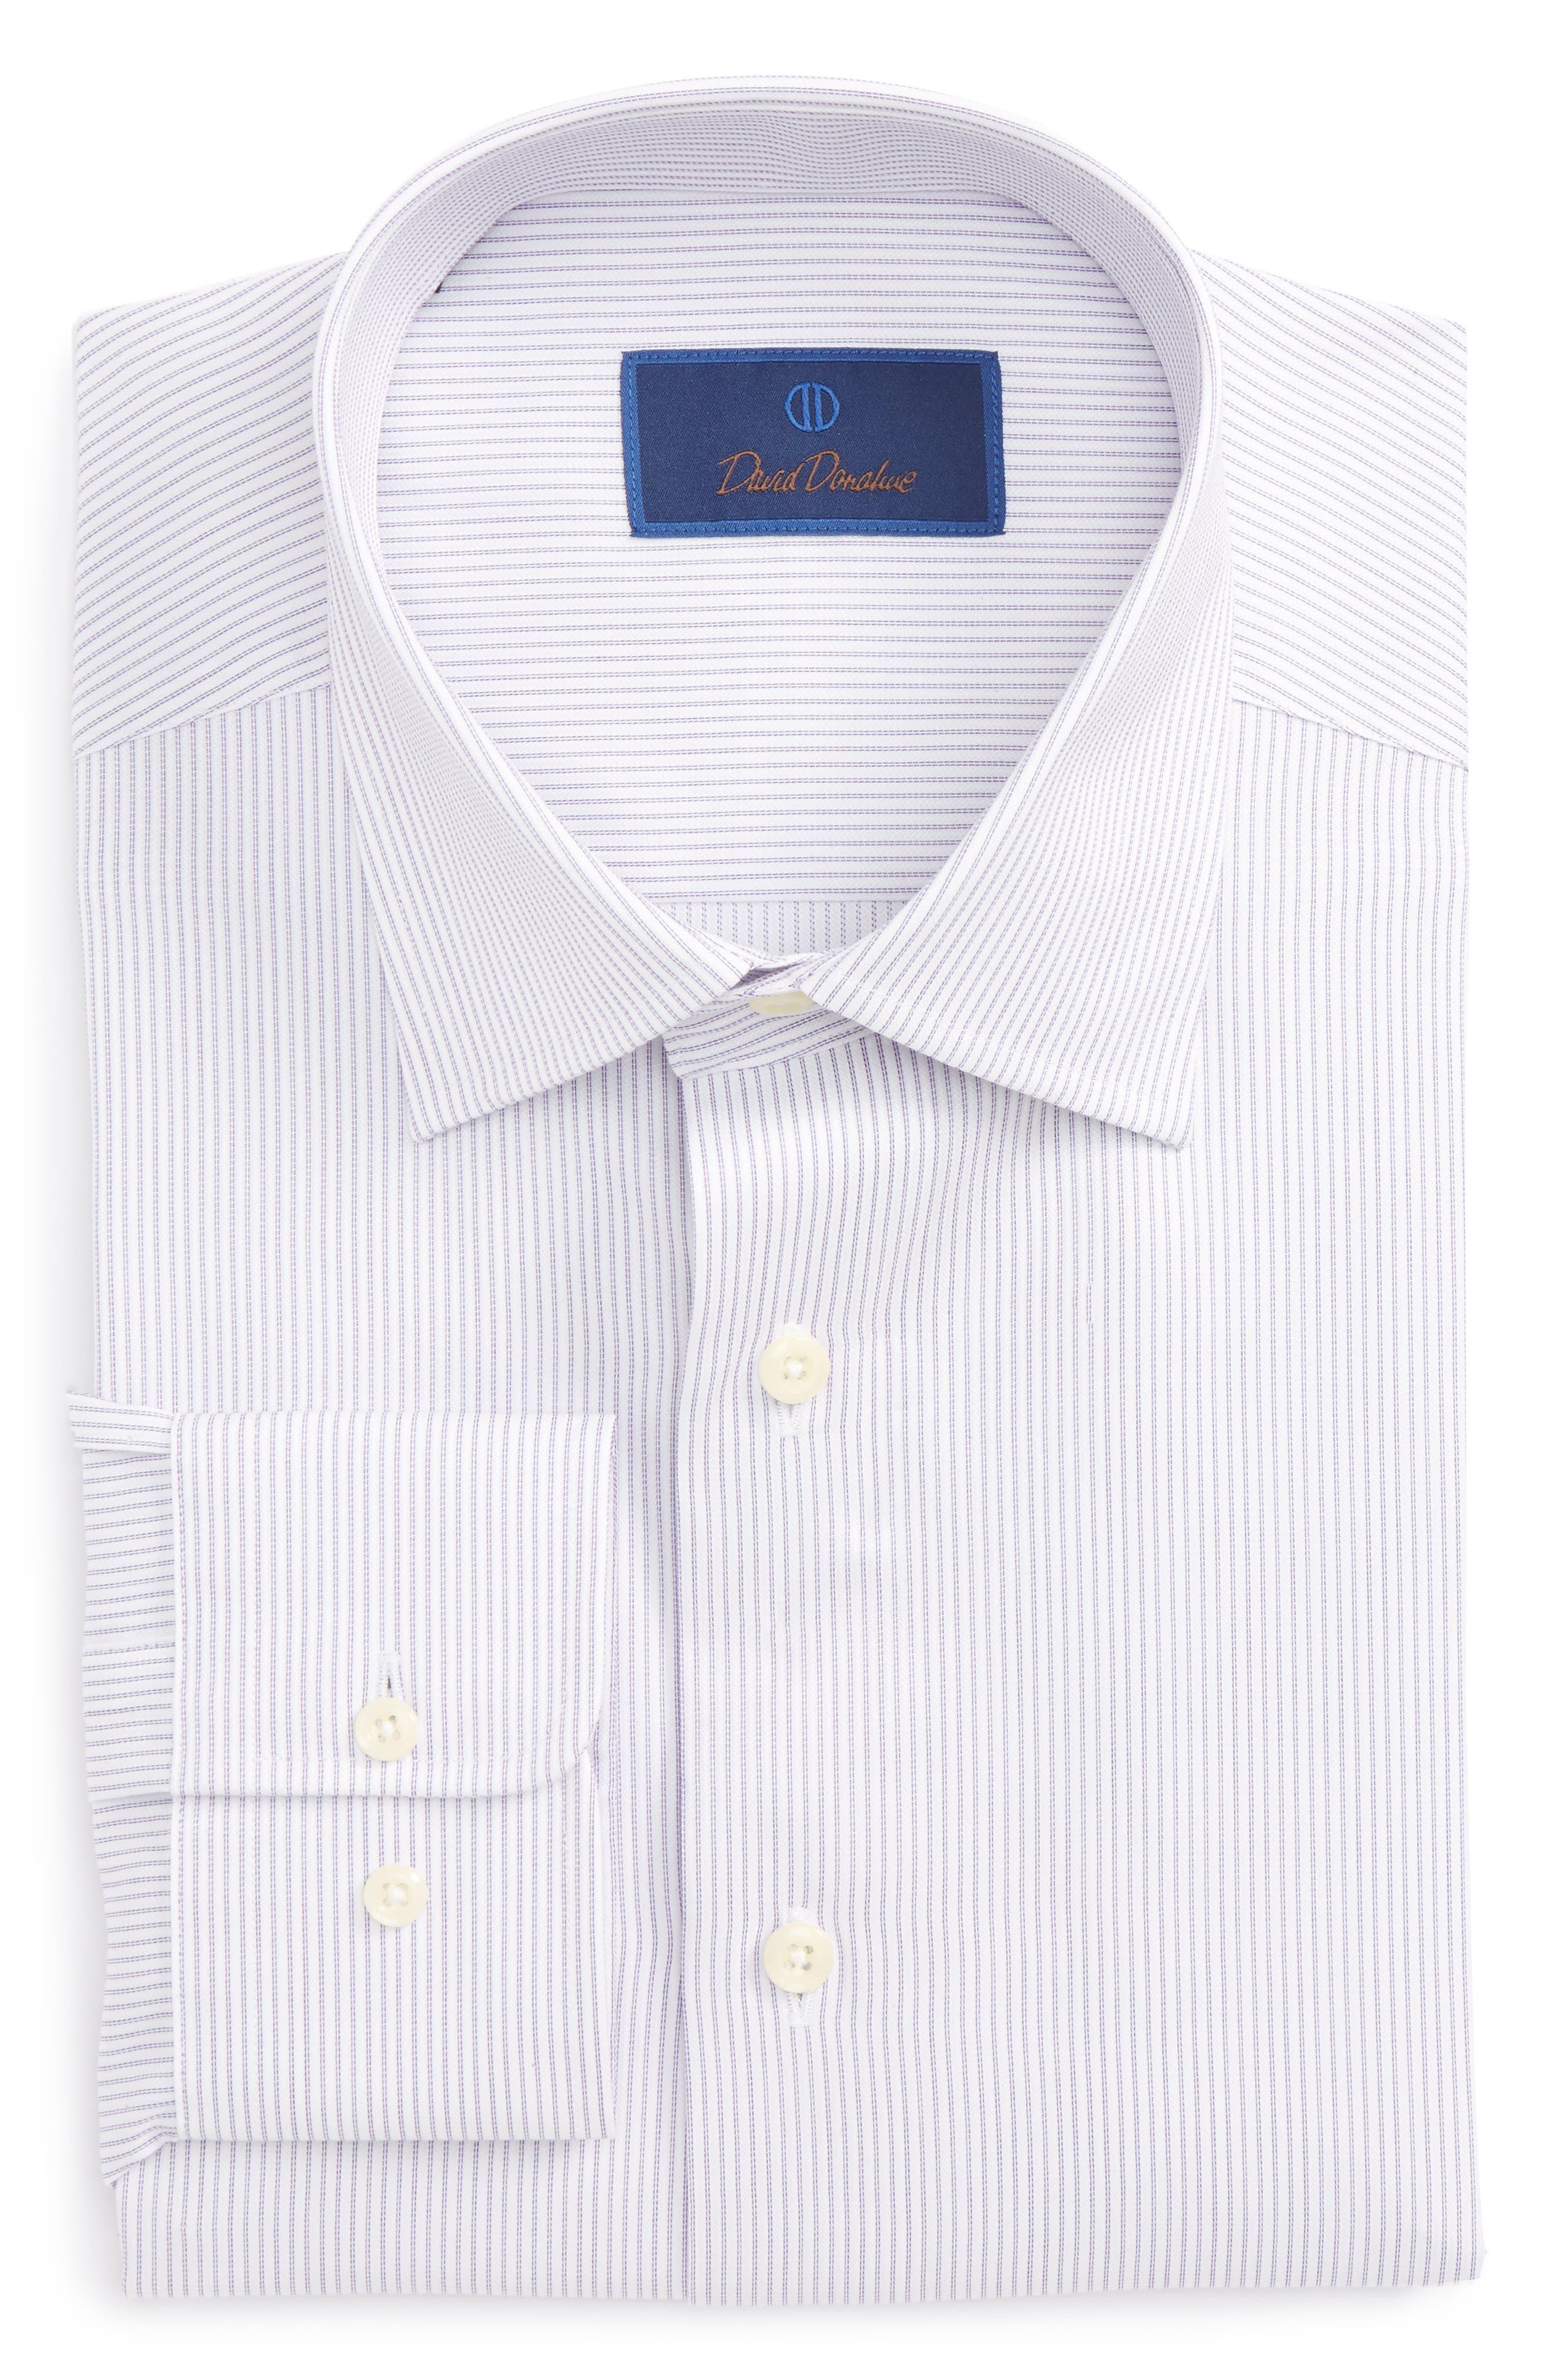 Regular Fit Stripe Dress Shirt,                             Main thumbnail 2, color,